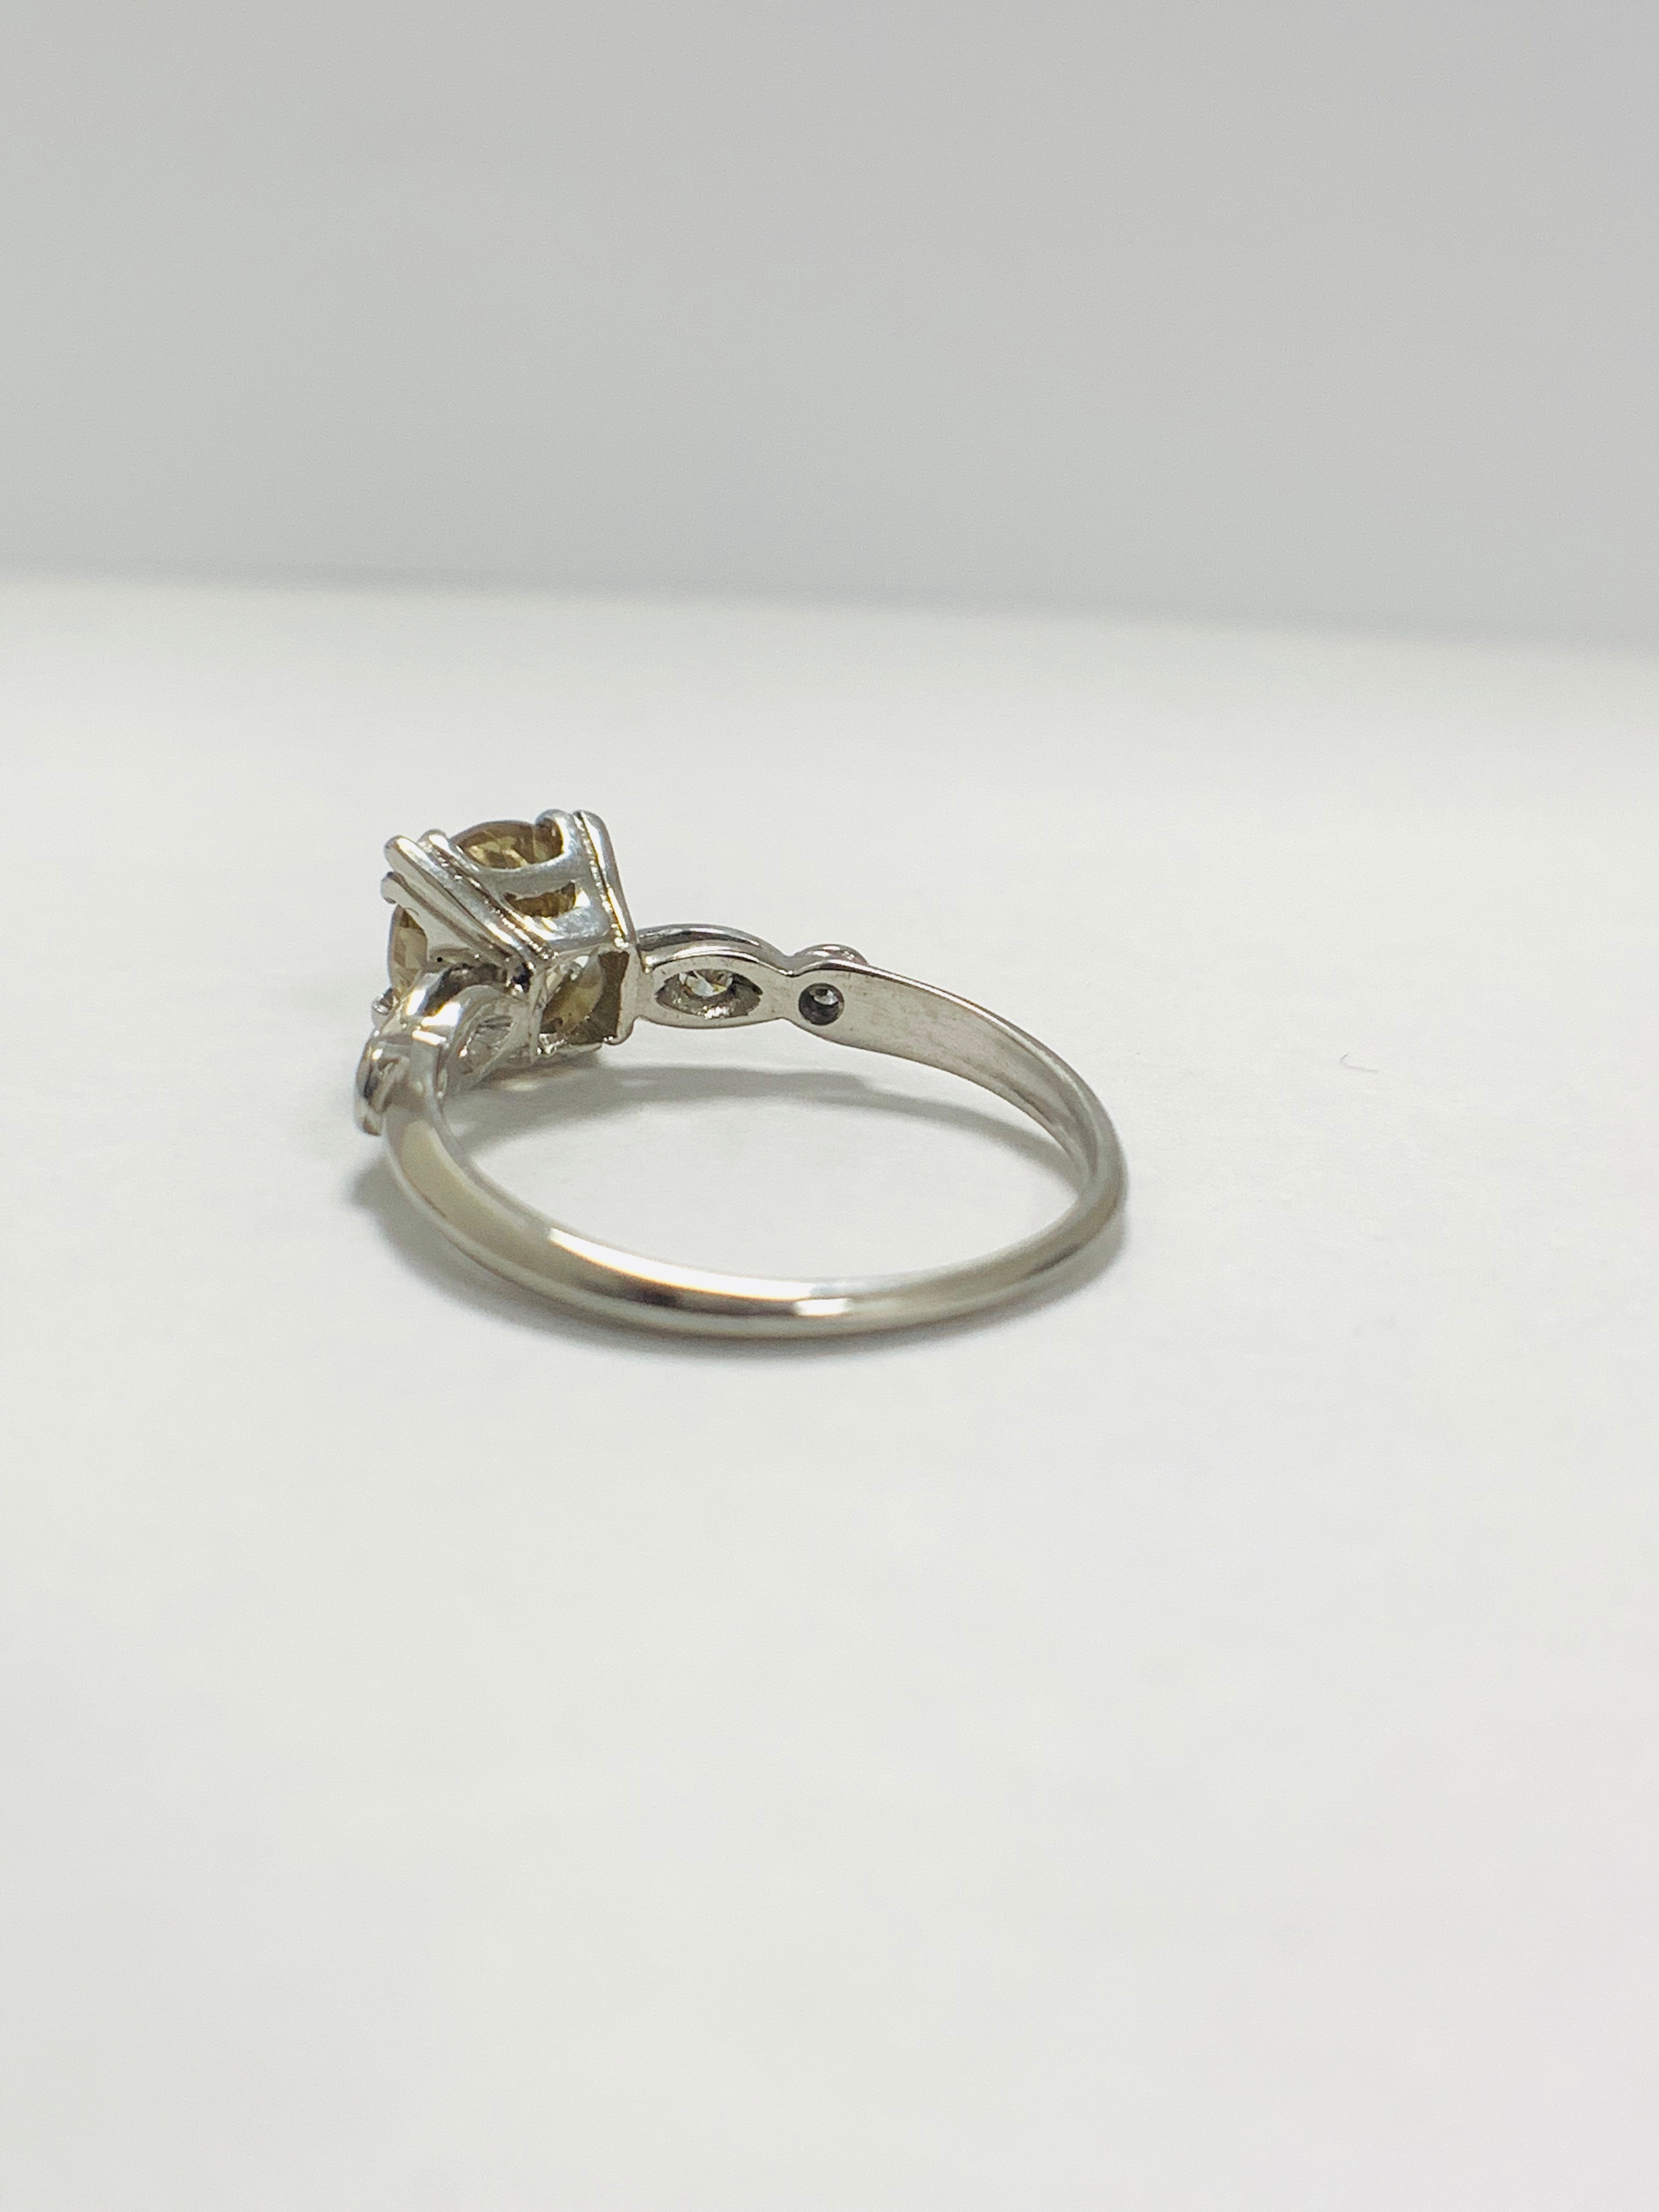 Platinum Diamond ring featuring centre, round brilliant cut, fancy light brown Diamond (1.55ct) - Image 4 of 14